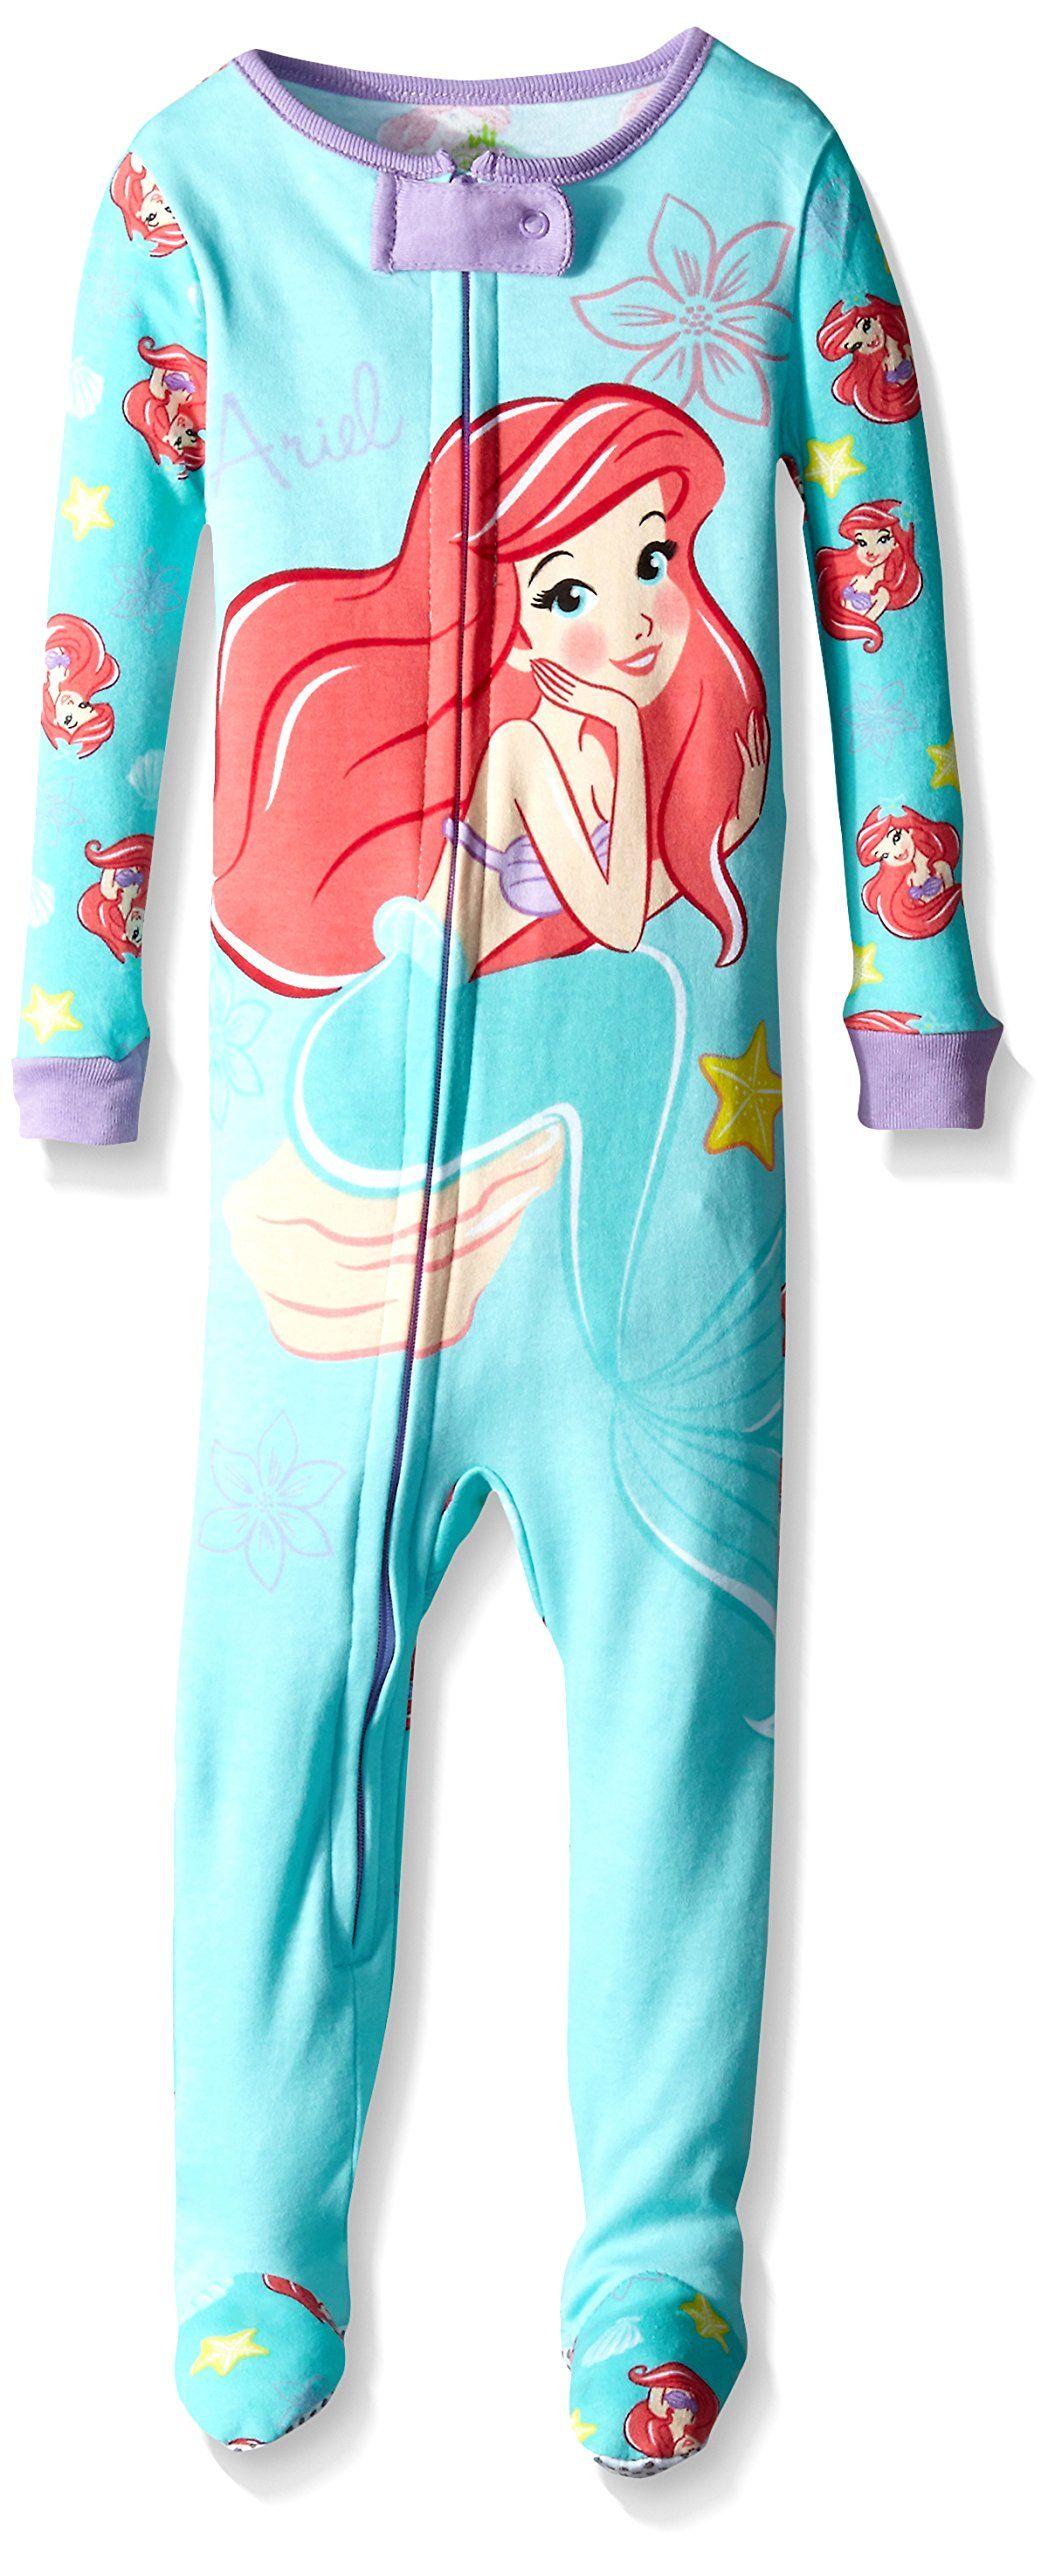 ... outlet online b7fc5 7ac8a Disney Baby-Girls Infant Ariel One Piece  Blanket Sleeper Sleep 572d10dd9